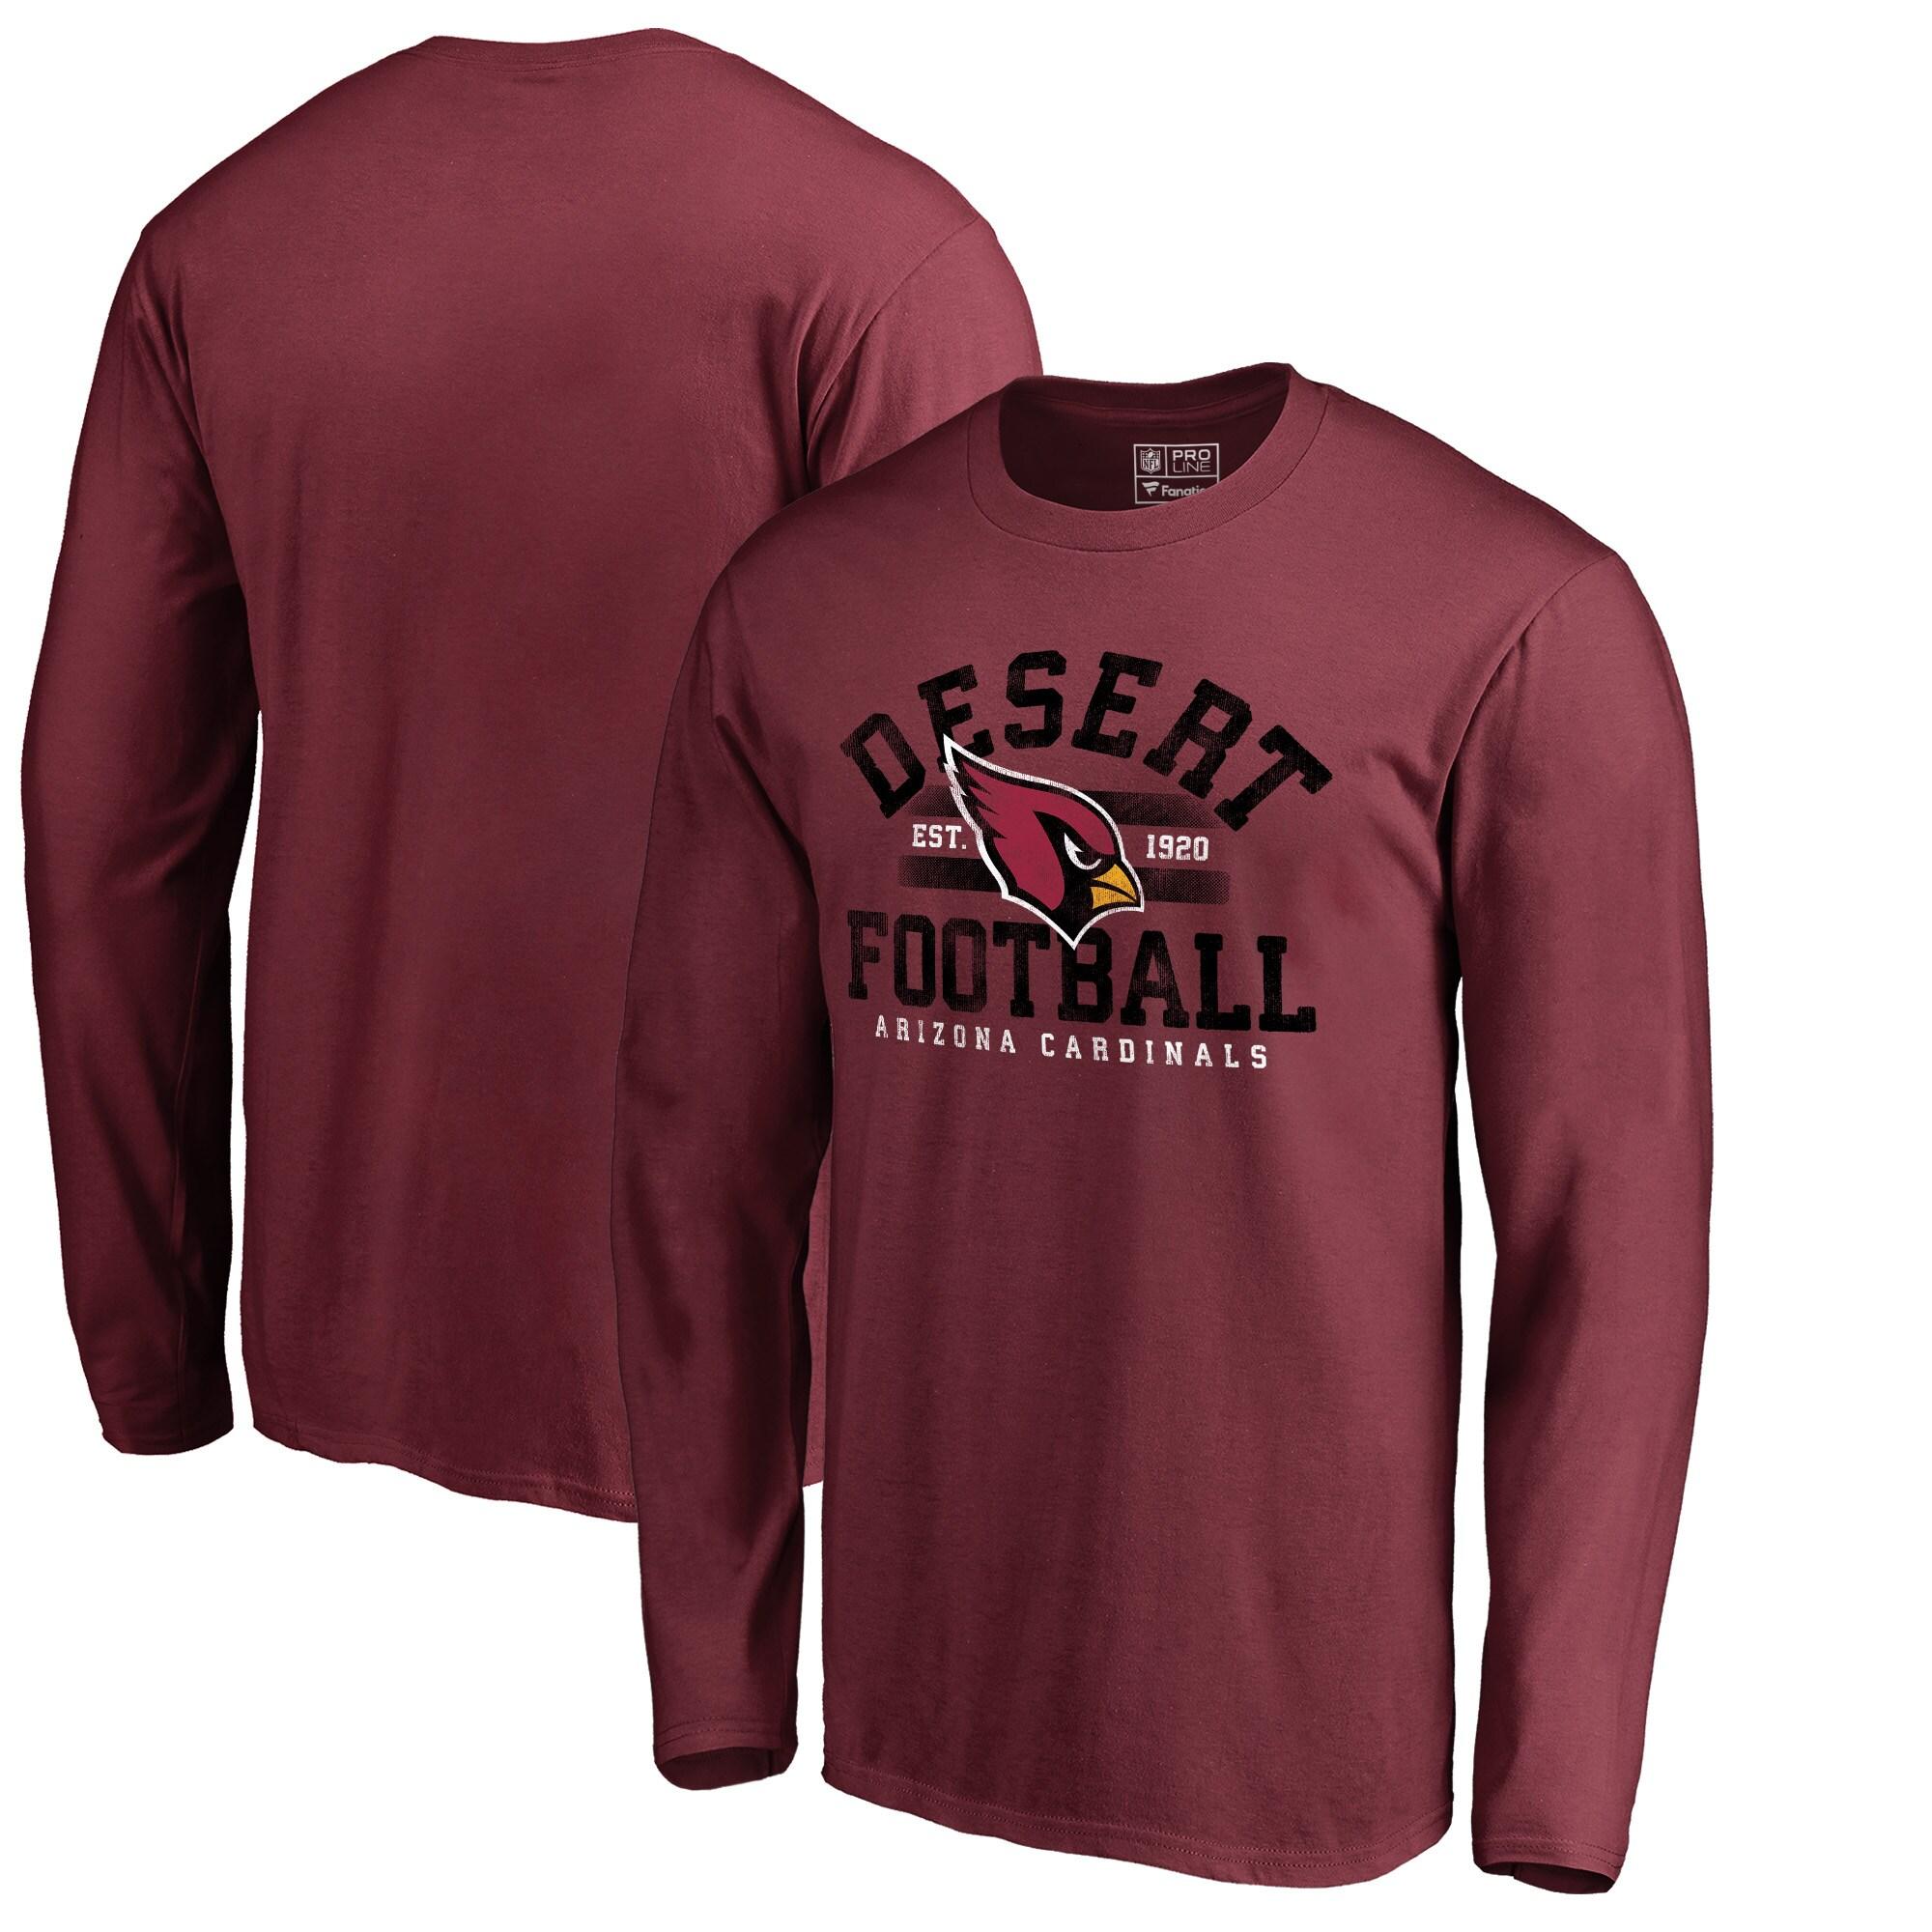 Arizona Cardinals NFL Pro Line by Fanatics Branded Hometown Collection Big & Tall Long Sleeve T-Shirt - Cardinal